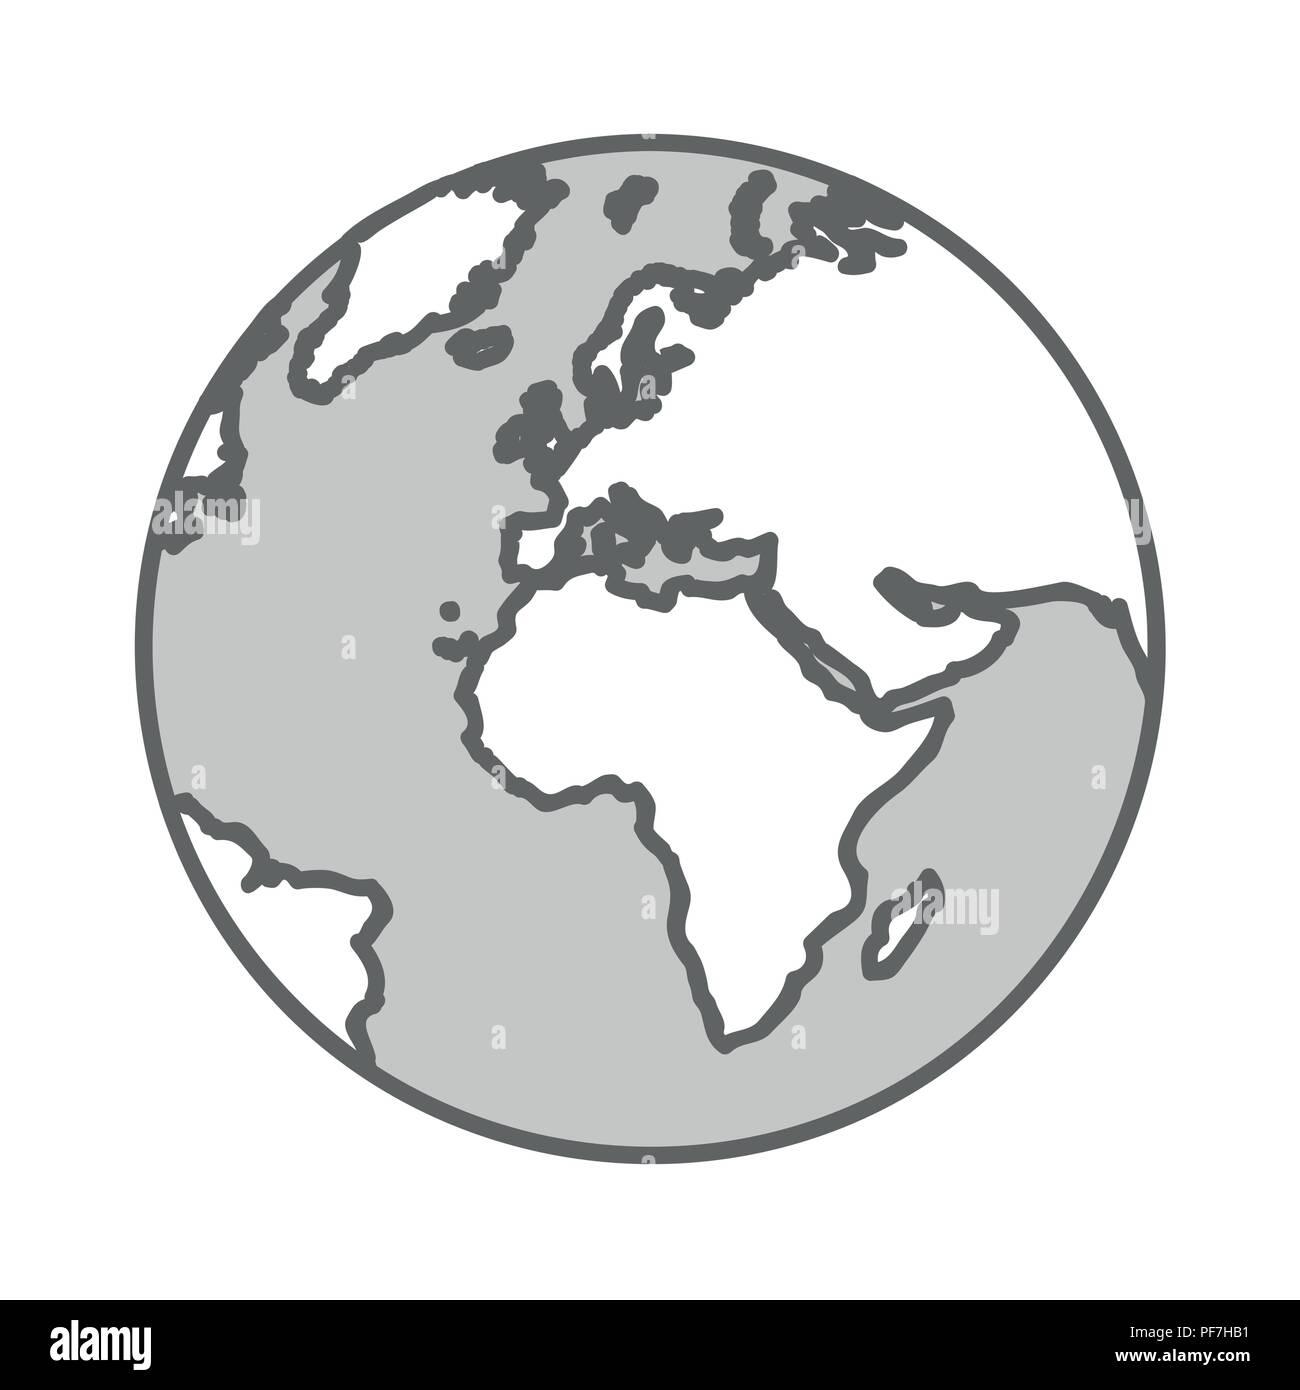 Globe Terrestre De La Terre Gris Dessin Simple Vector Illustration